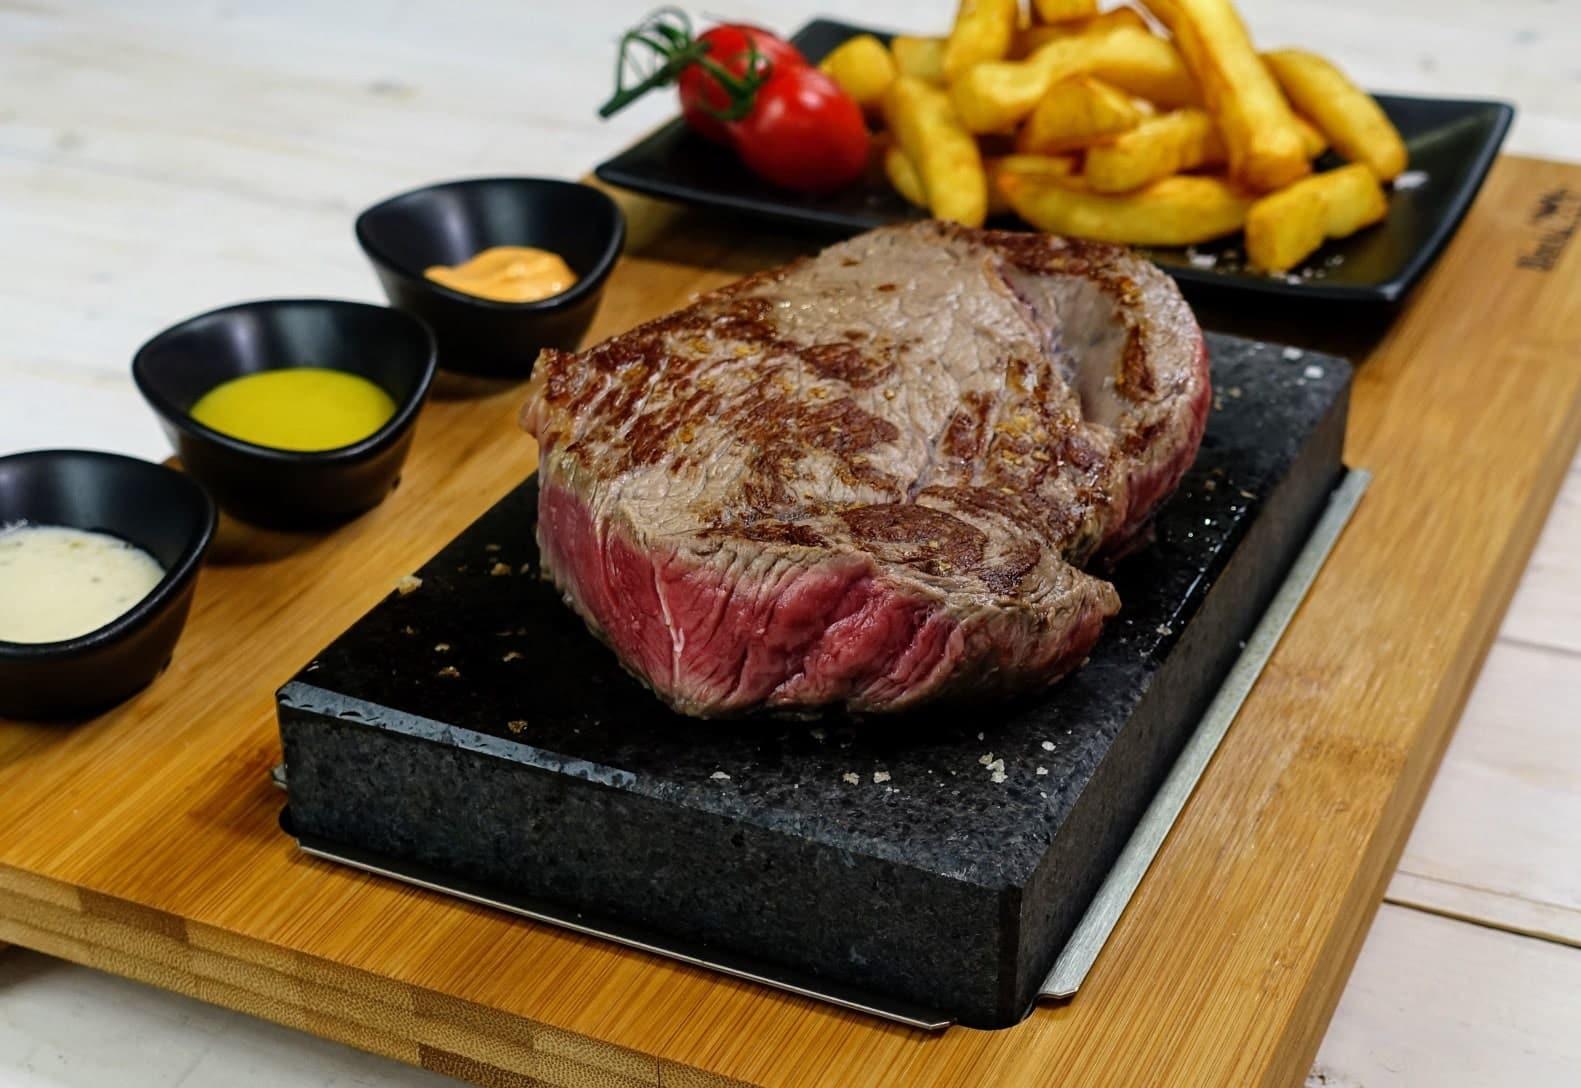 Steak on a hot stone in The Hemingways